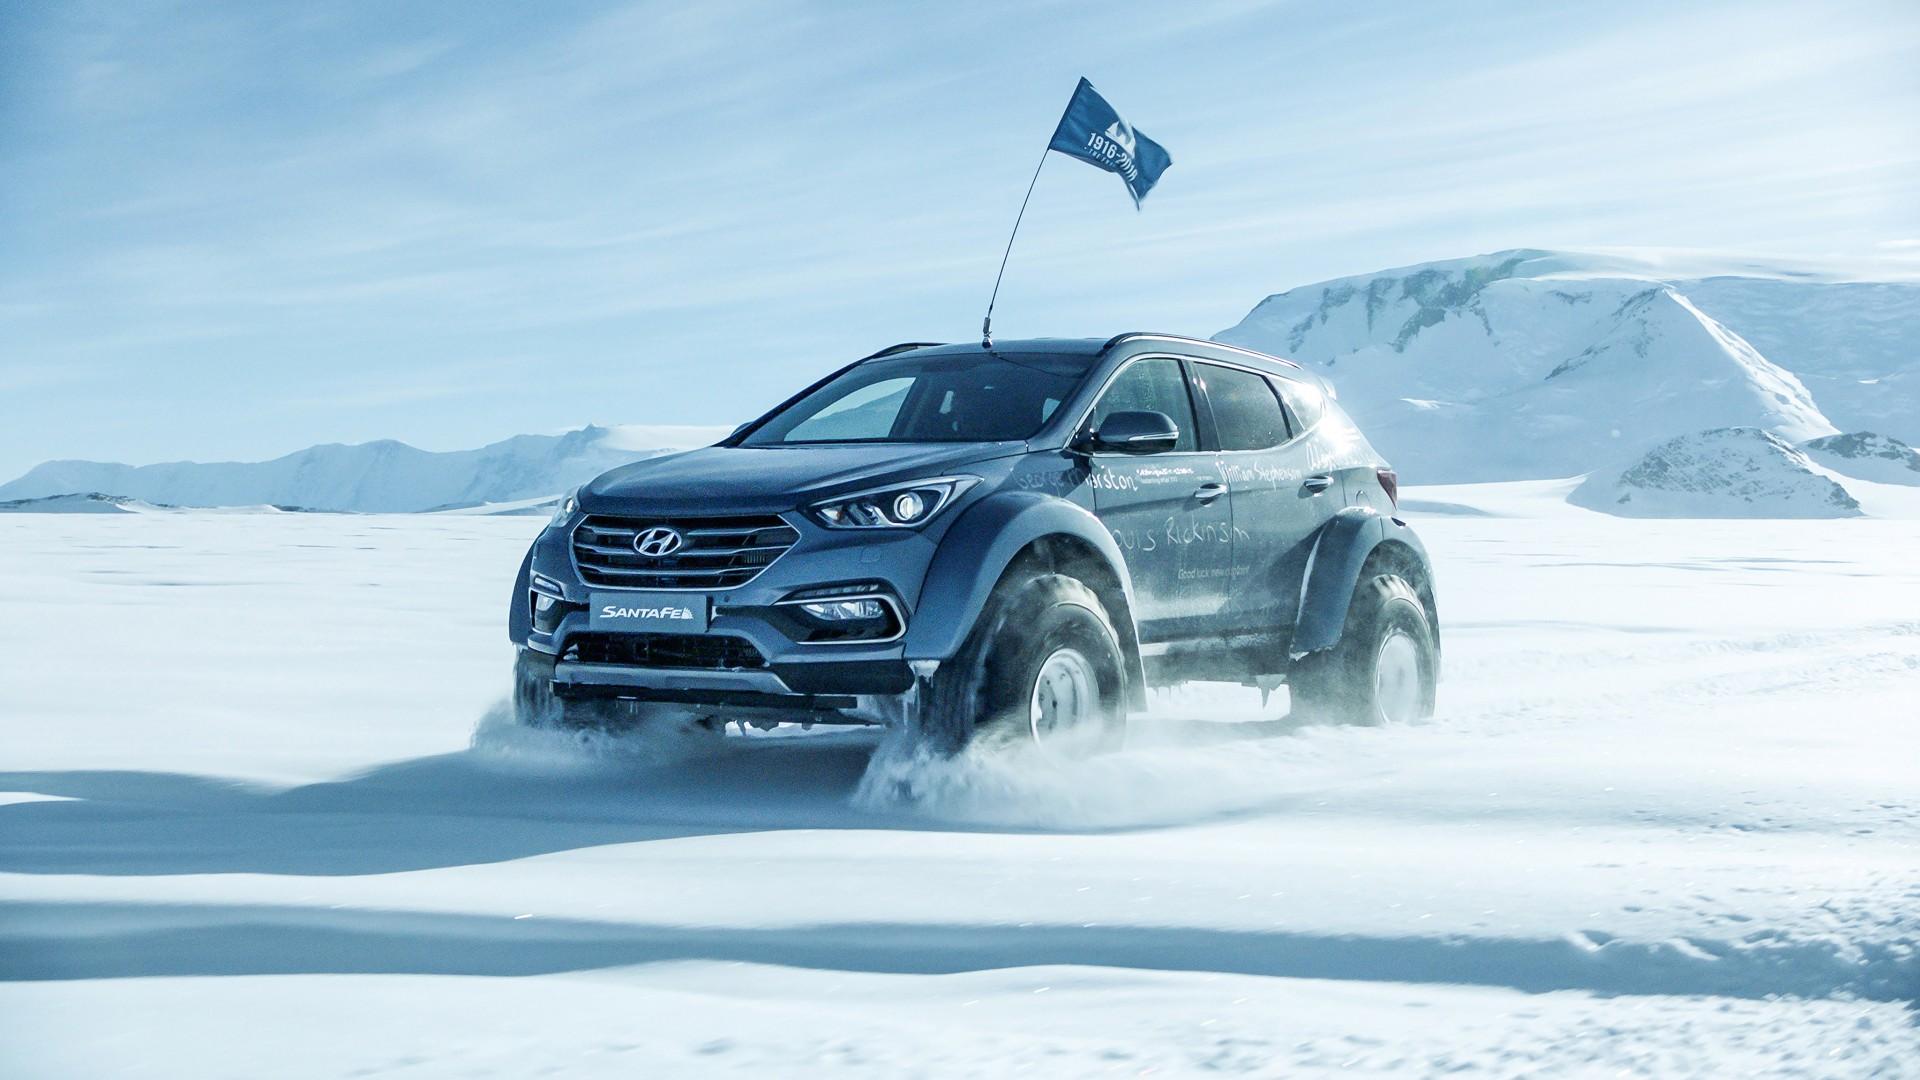 How does the honda crosstour compare to the hyundai santa fe? 2017 Arctic Trucks Hyundai Santa Fe Wallpaper   HD Car